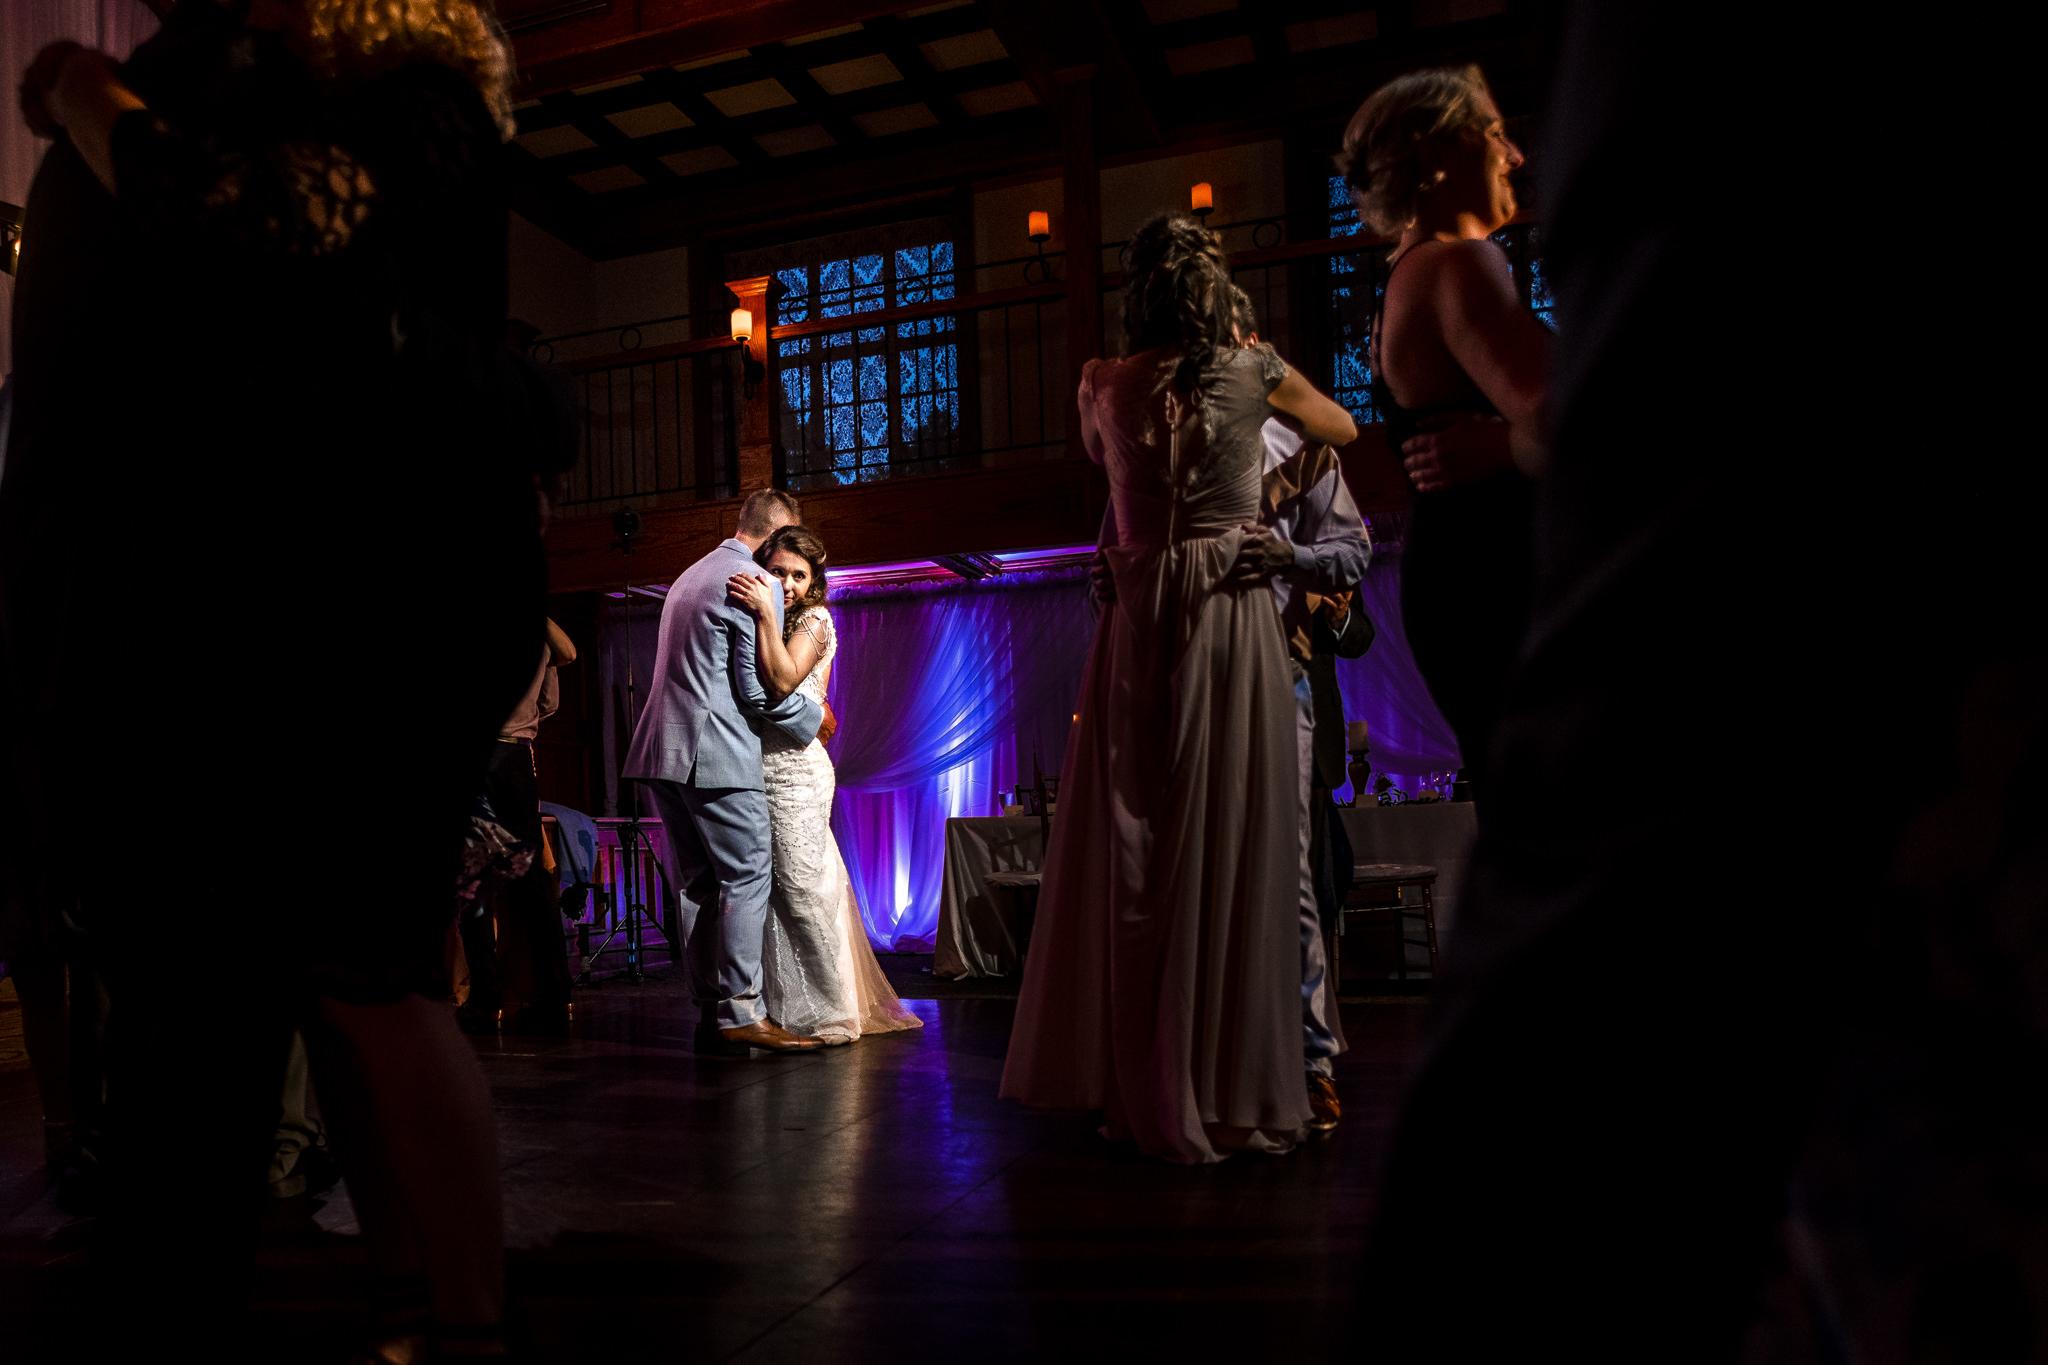 Barbato-Moorestown-Community-House-Wedding-New-Jersey-Photographer-45.JPG